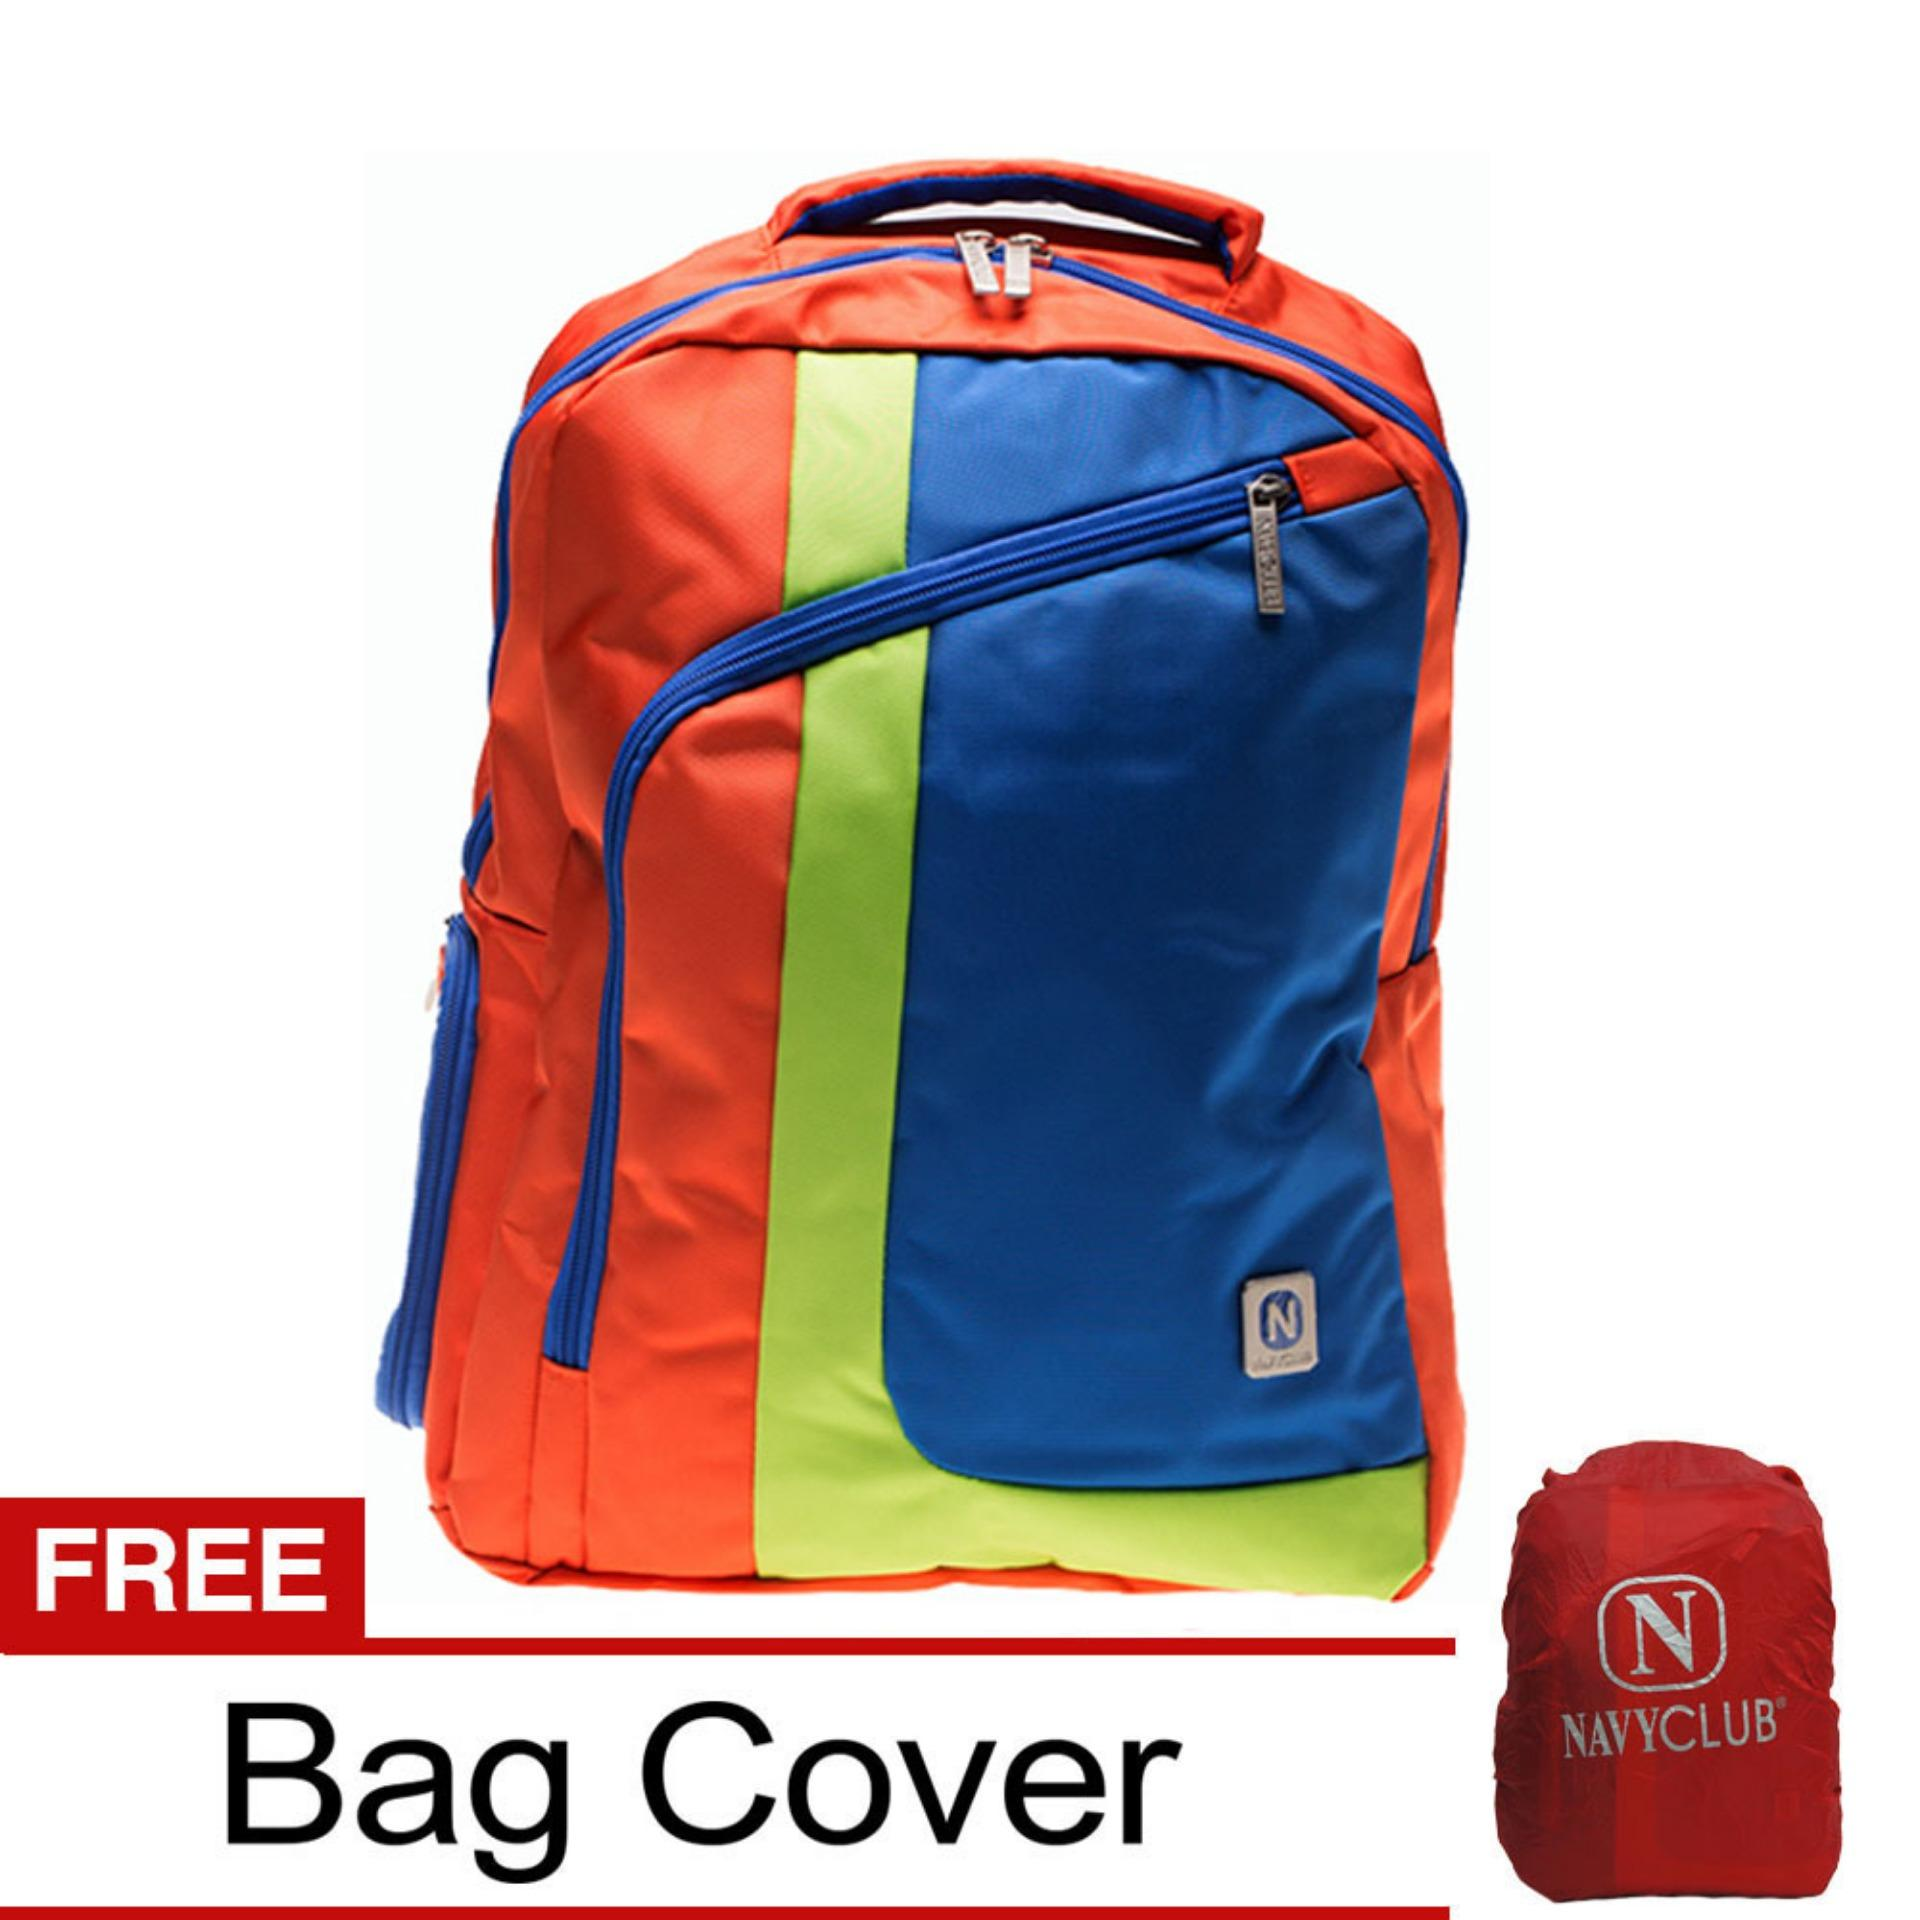 Promo Navy Club Tas Ransel Laptop Kasual 3260 Tas Pria Tas Wanita Tas Laptop Backpack Up To 15 Inch Bonus Bag Cover Orange B Di Dki Jakarta